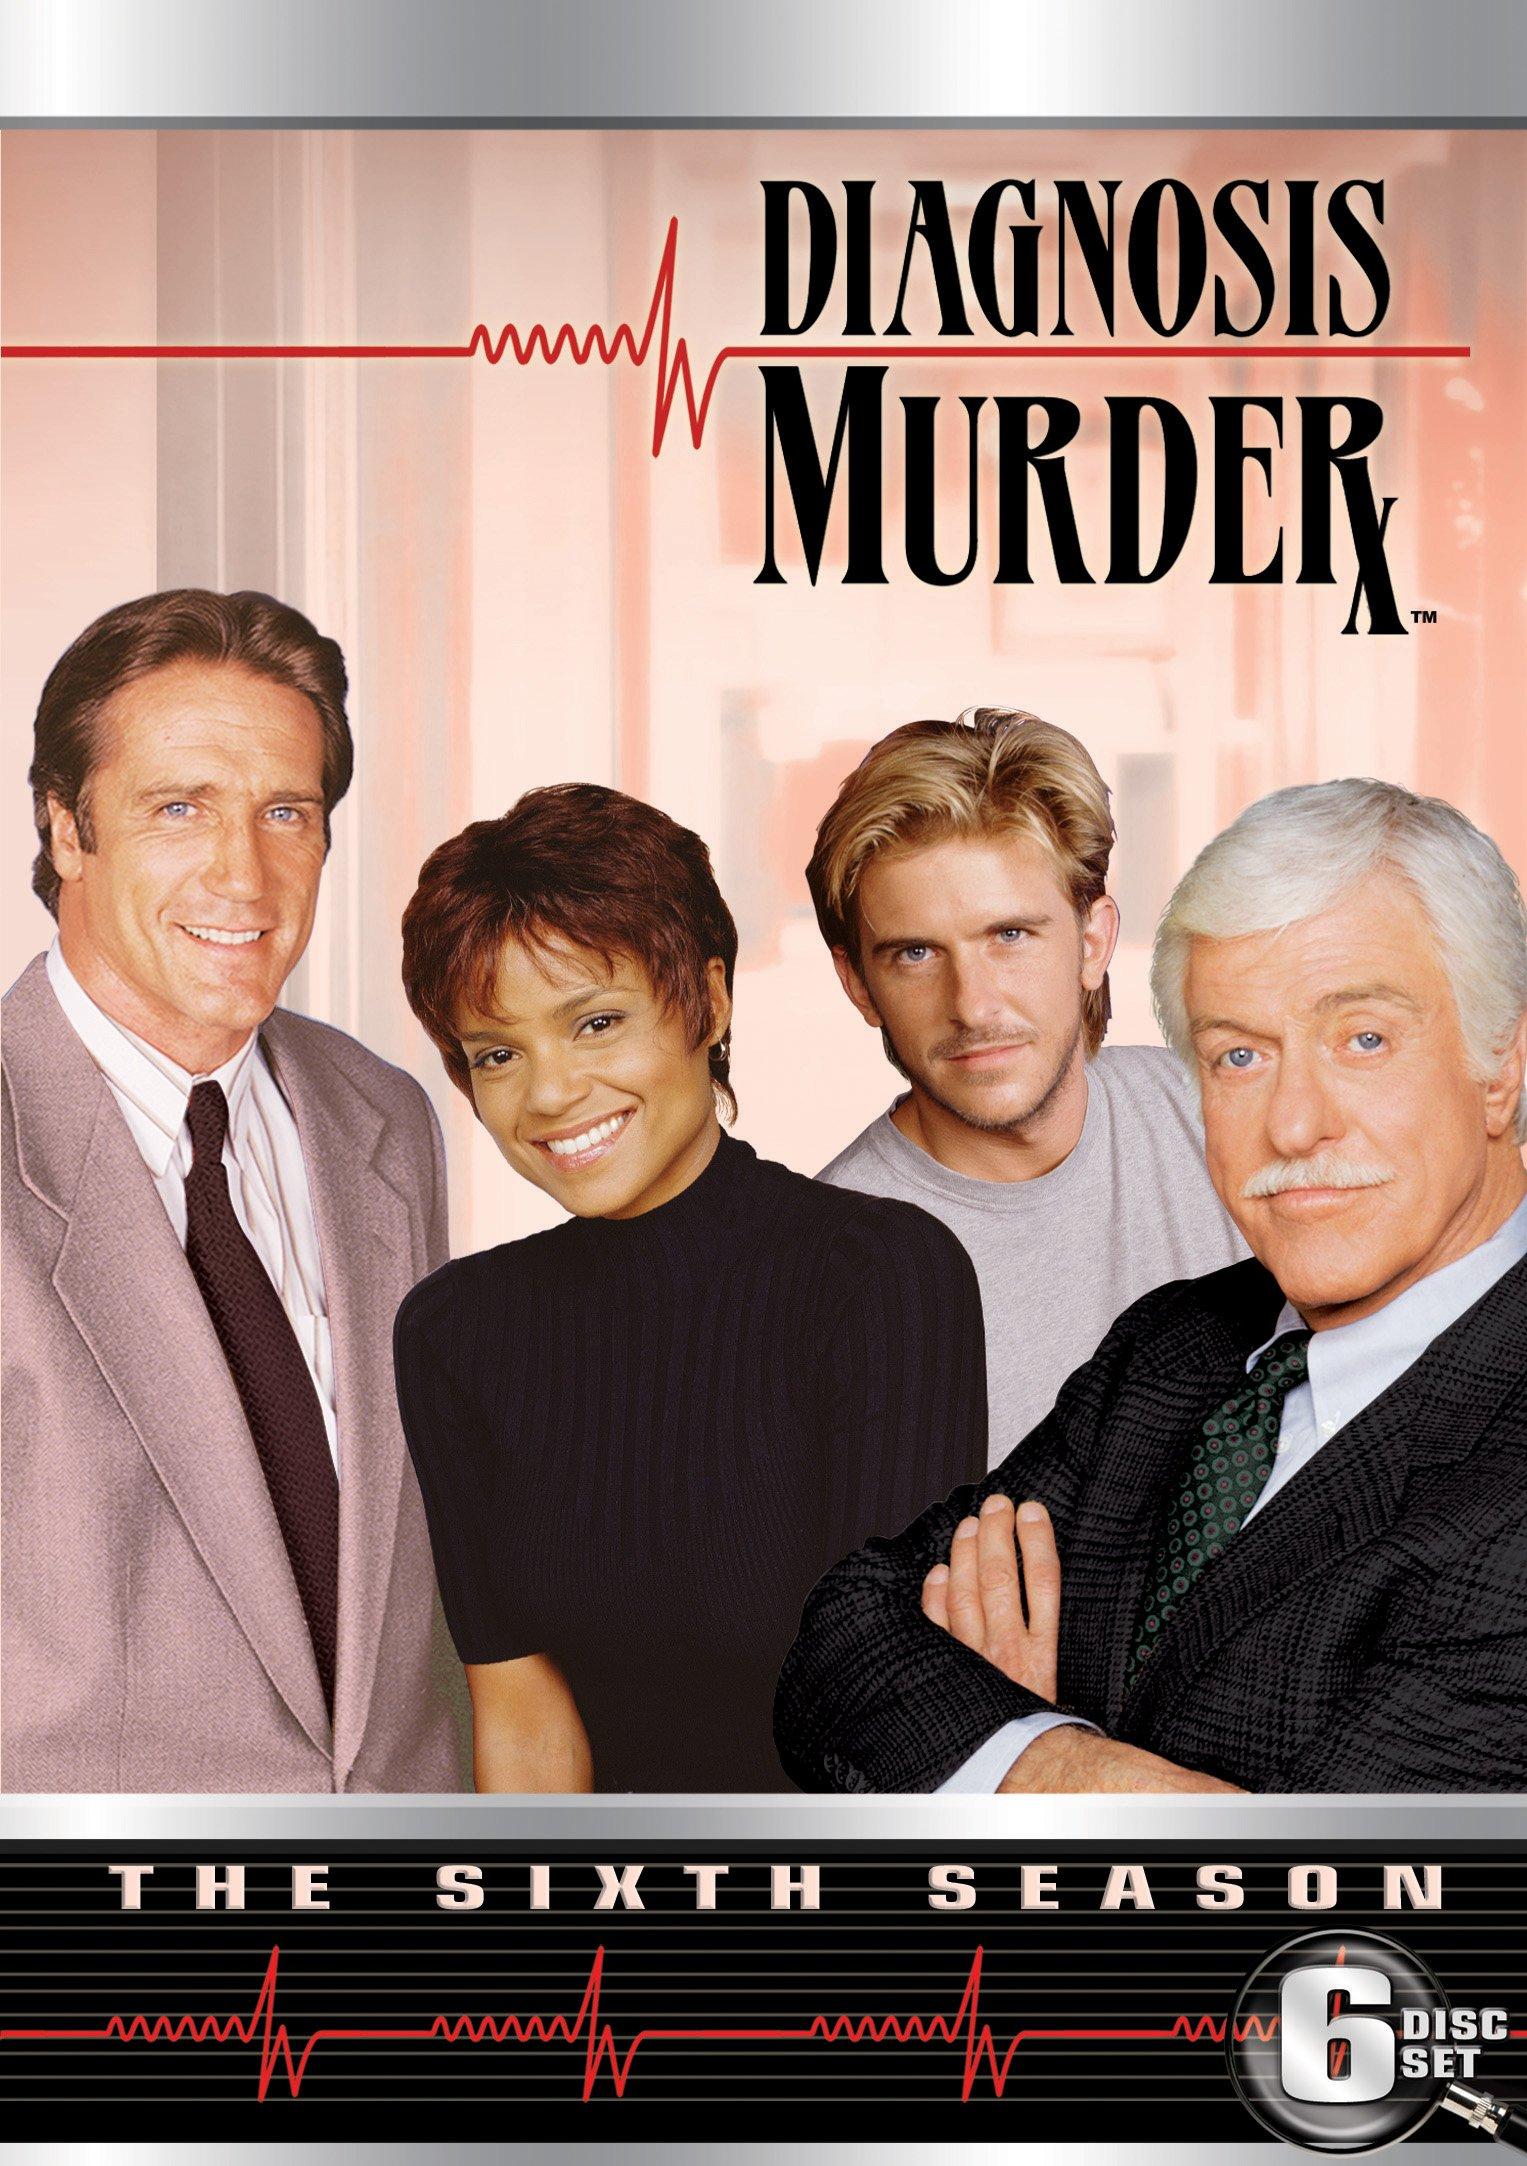 DVD : Diagnosis Murder: The Sixth Season (DVD)